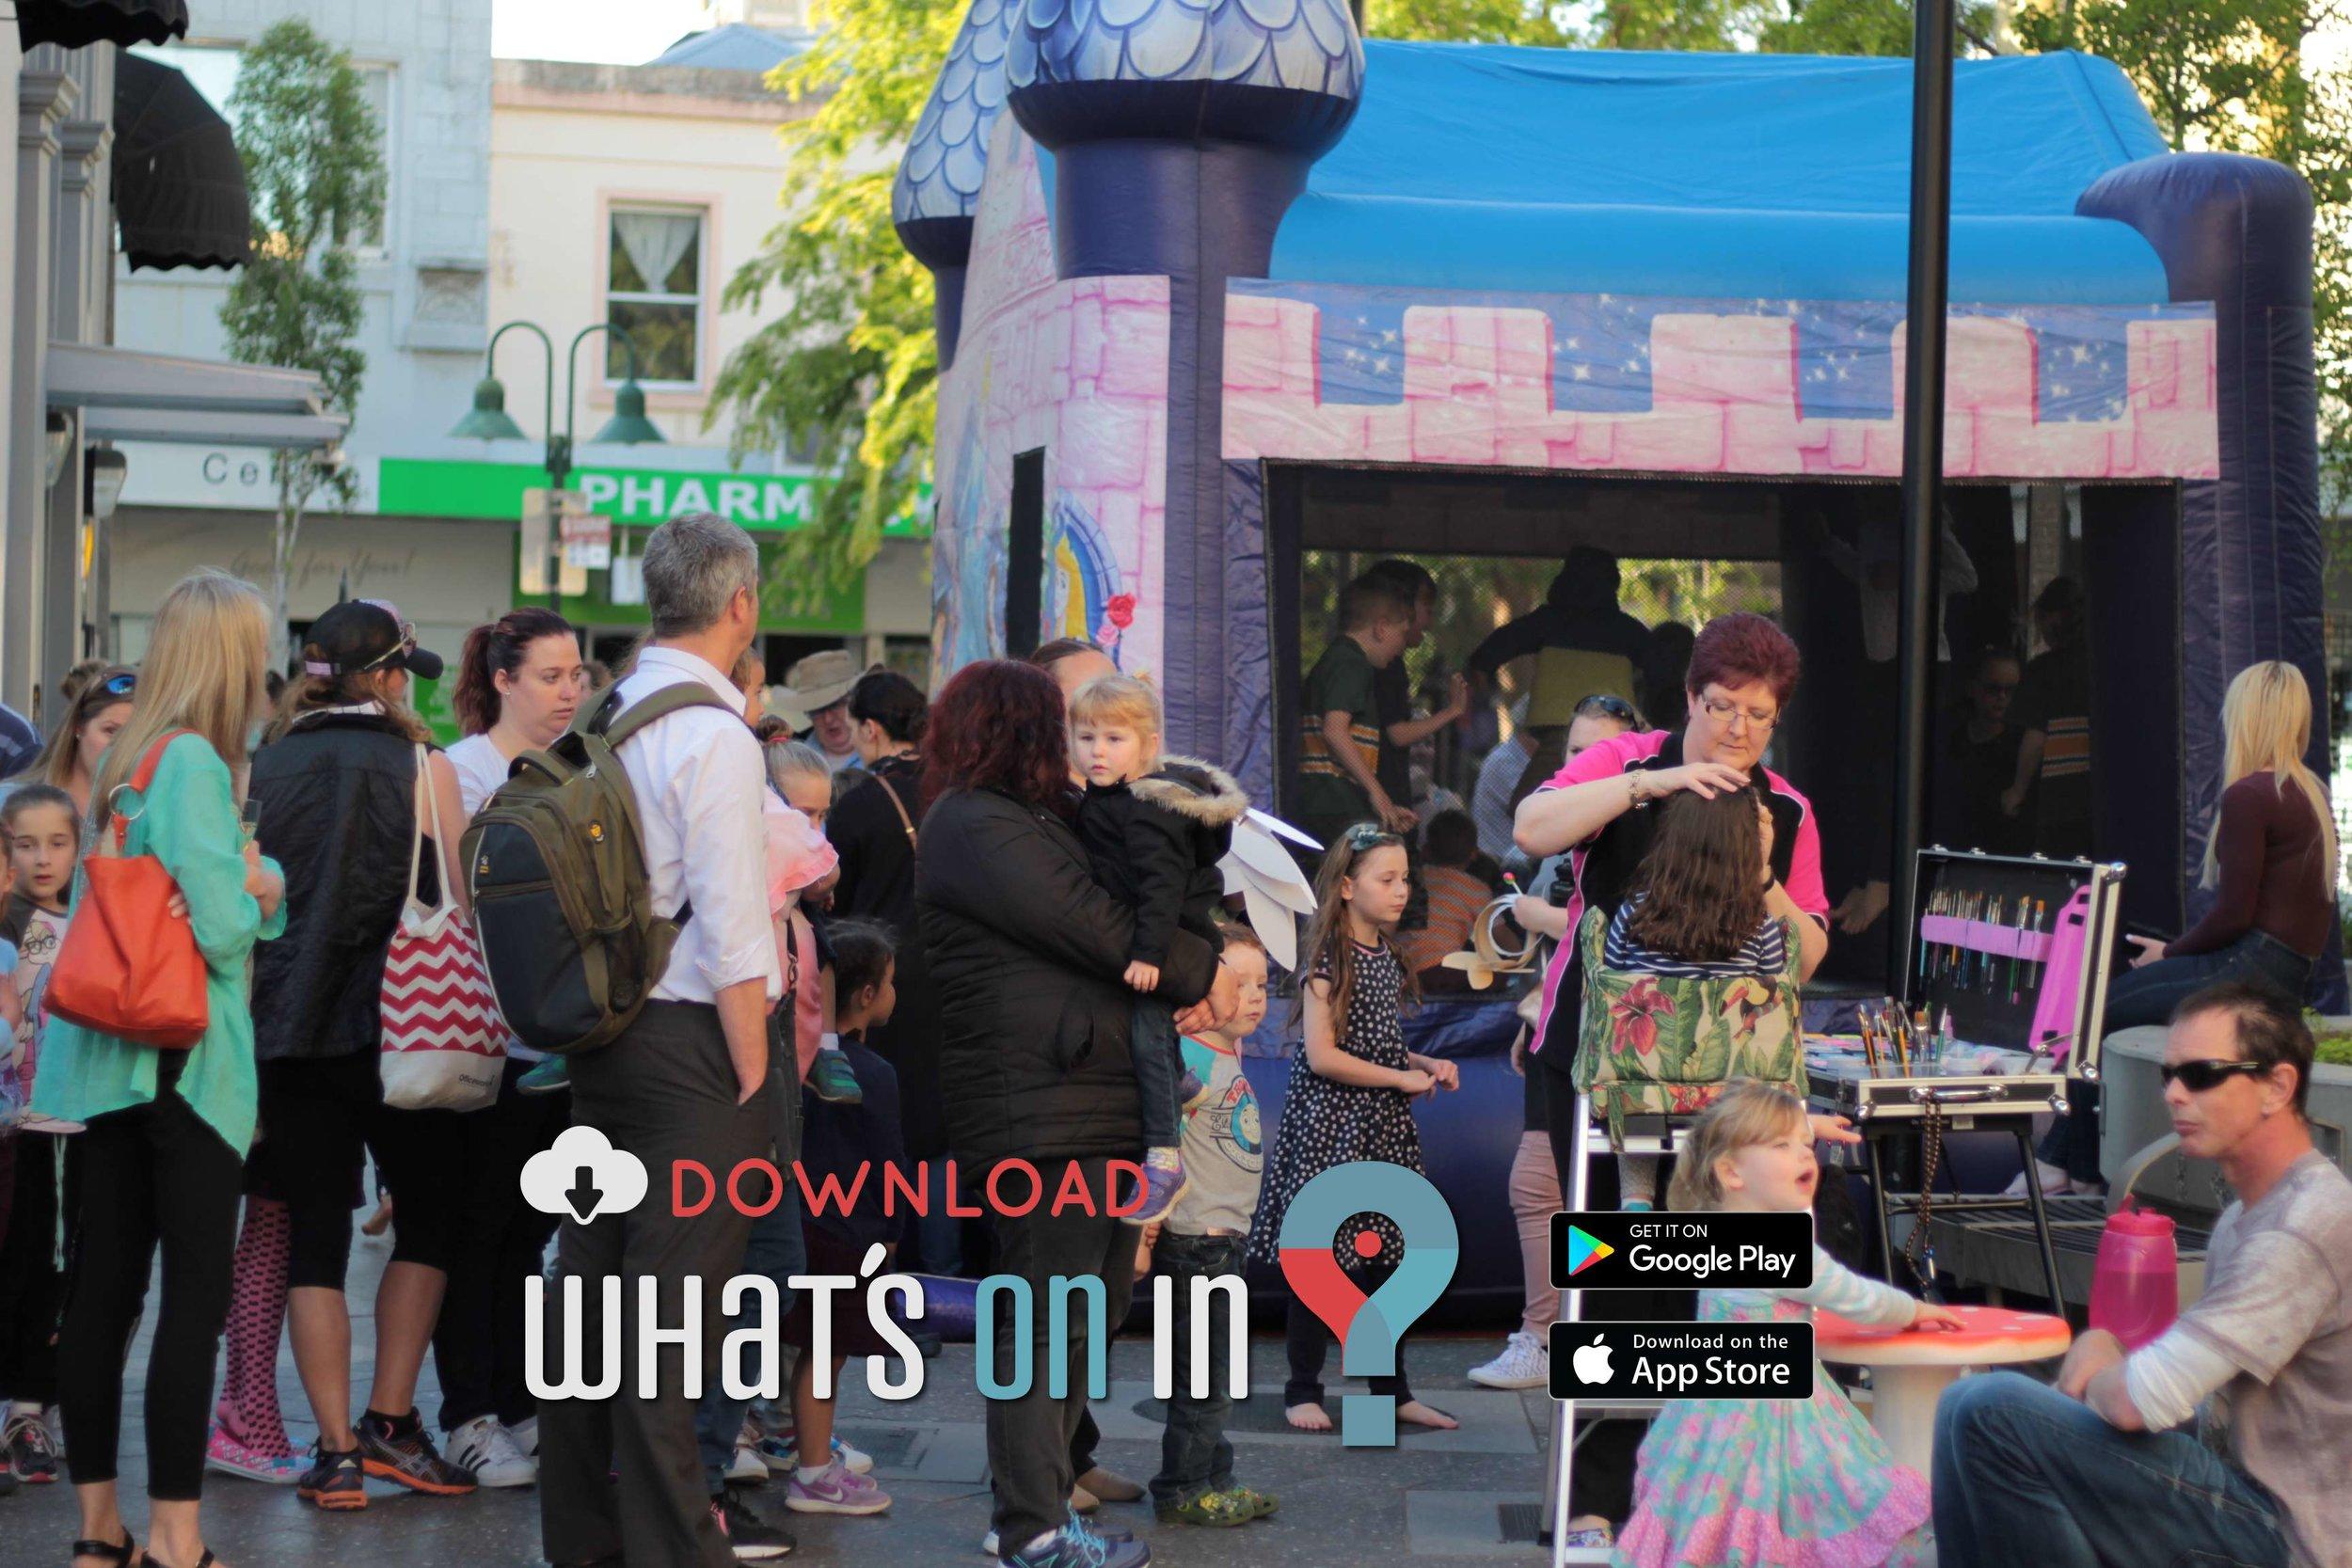 Mad Hatter's Twilight Markets, Launceston, Tasmania 2016 - What's On In App 030 IMG_8474.jpg